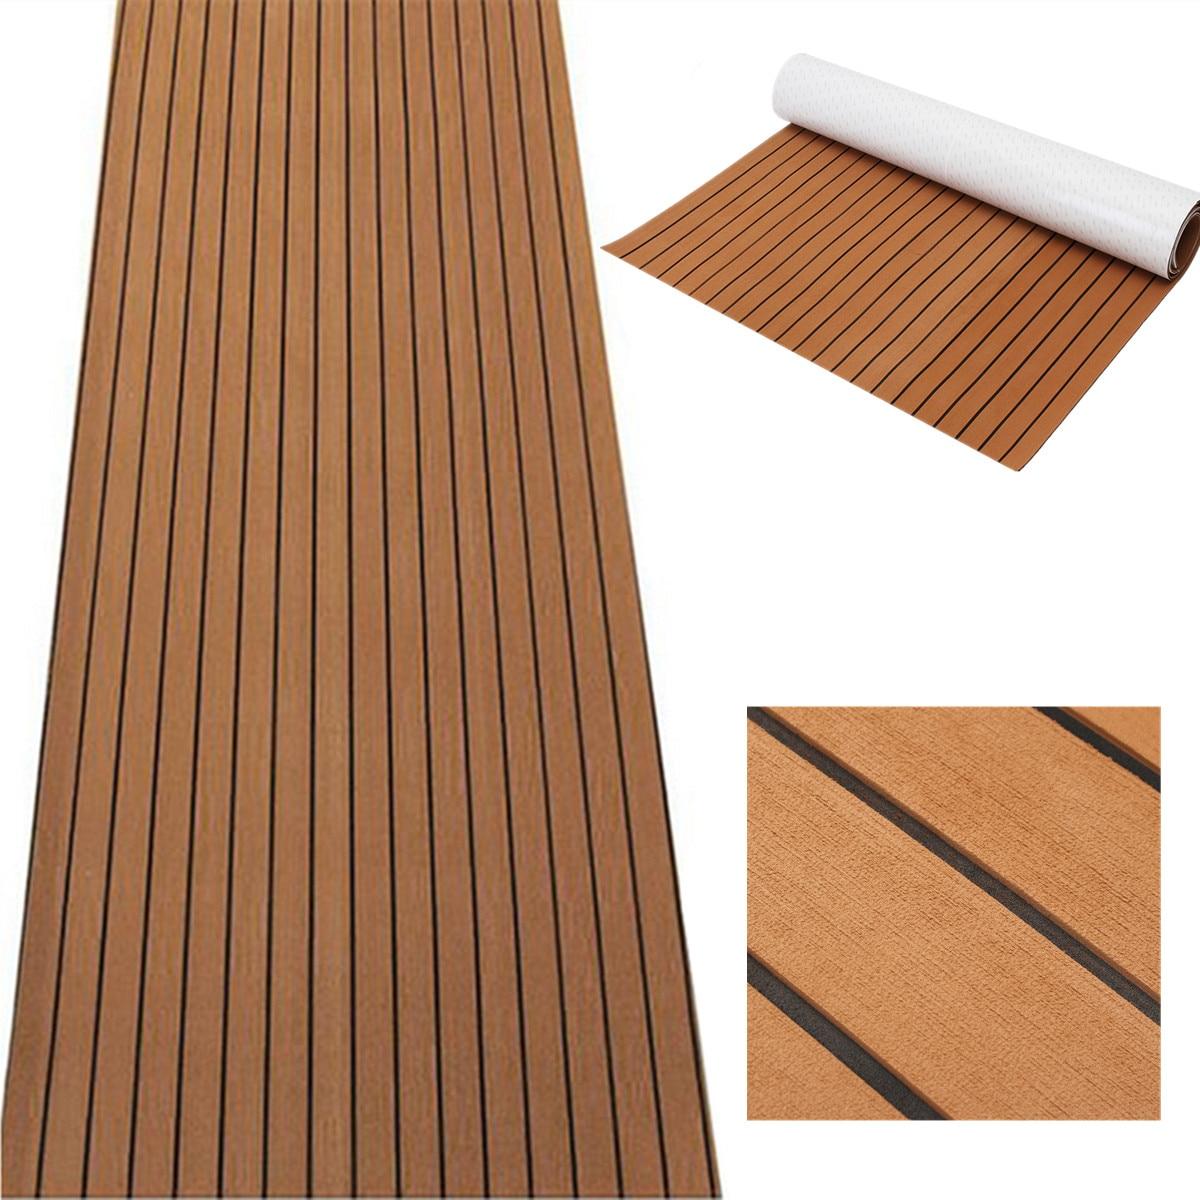 Self Adhesive EVA Foam Faux Teak Sheet Boat Yacht Synthetic Teak Decking Floor Mat Brown and Black 1200mmx2400mm 5mm teak house ваза ingrid